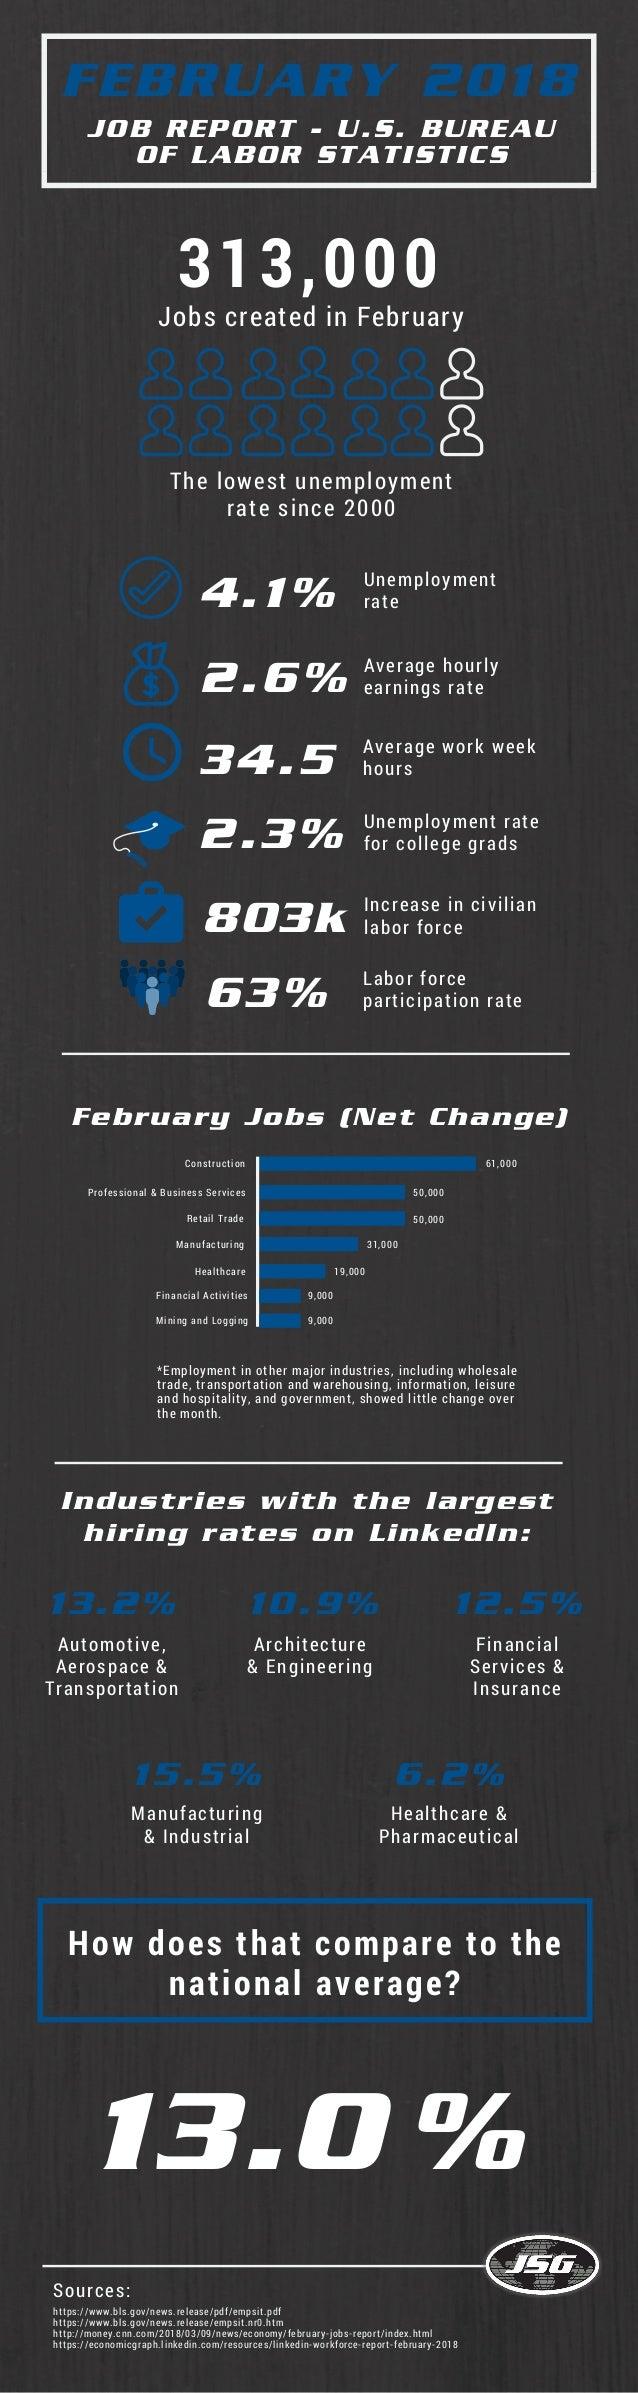 FEBRUARY 2018 JOB REPORT - U.S. BUREAU OF LABOR STATISTICS Industries with the largest hiring rates on LinkedIn: 313,000 J...